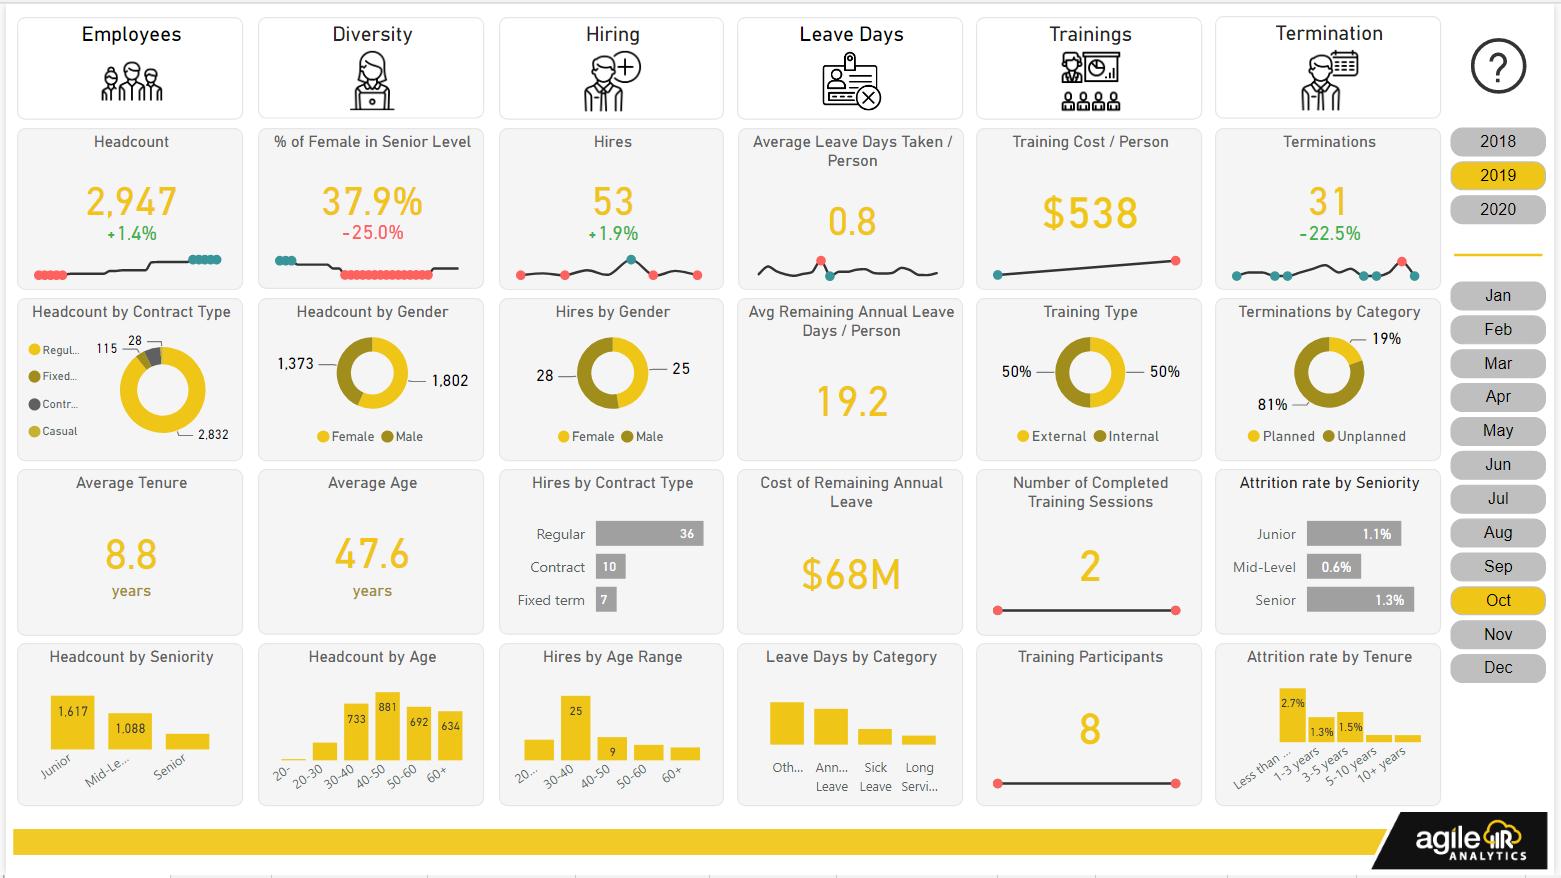 Agile HR Analytics 2.0